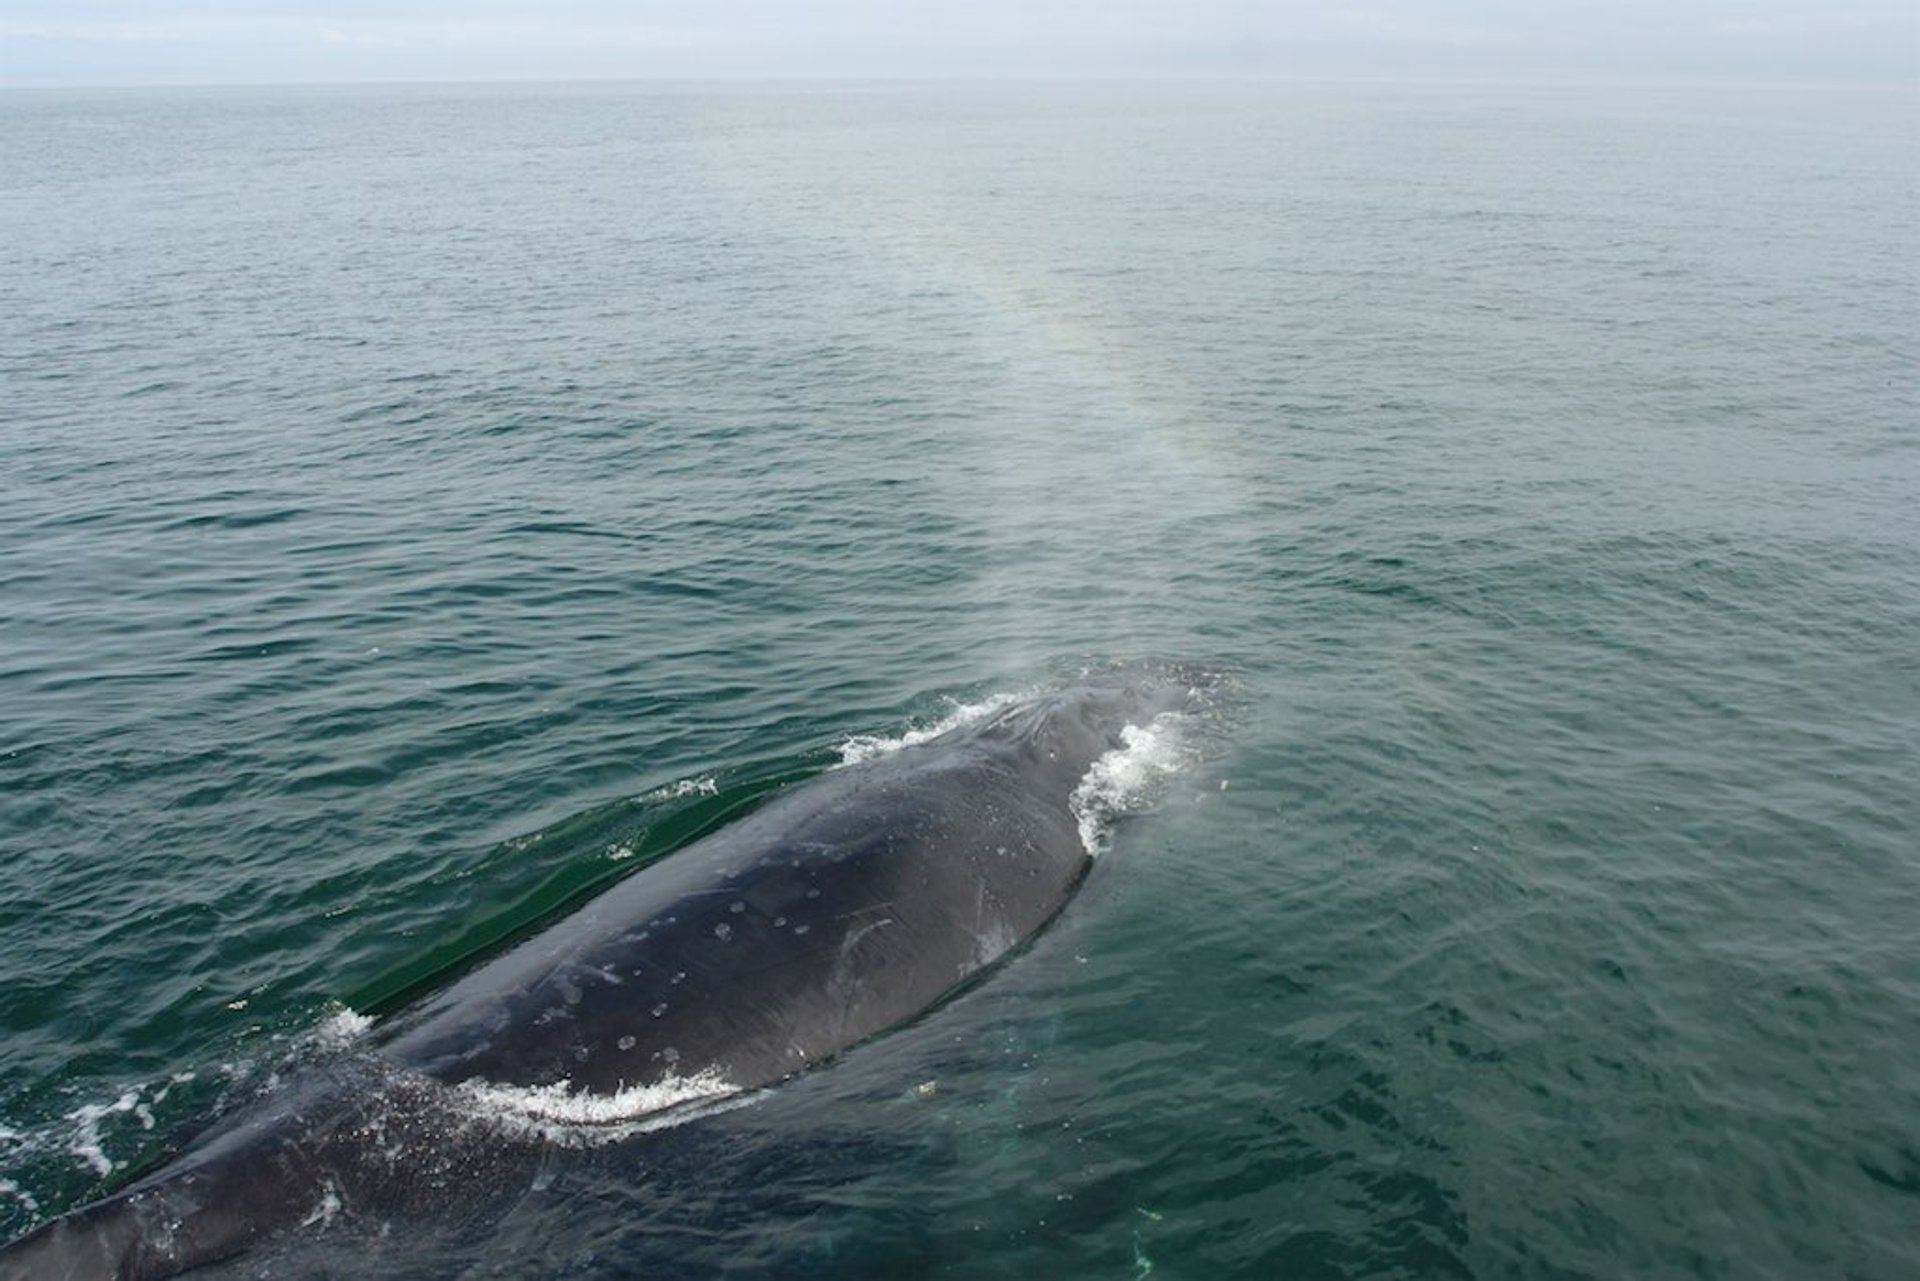 Whale Watching in California - Best Season 2020